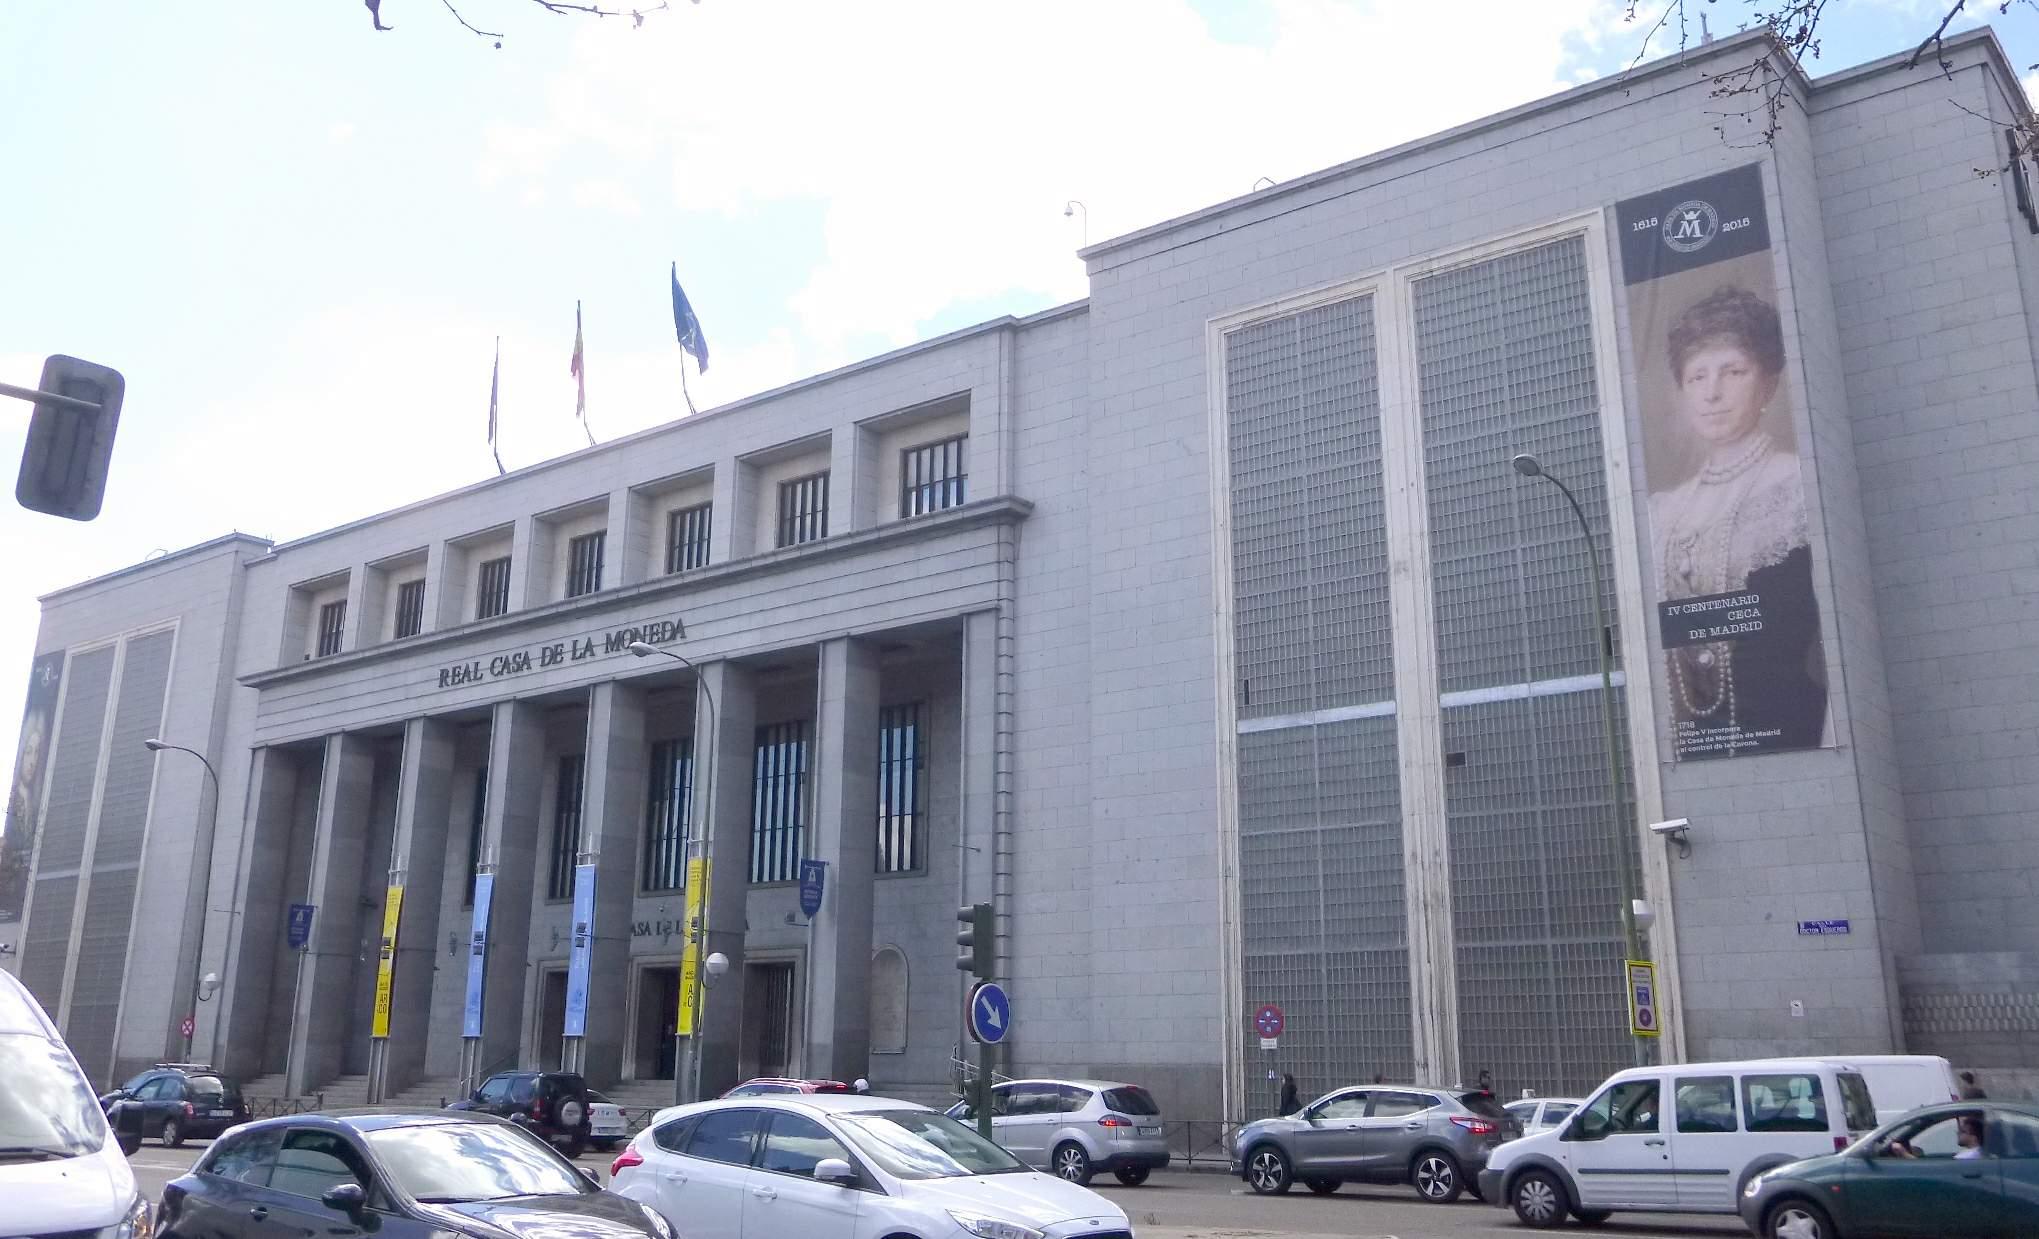 File madrid real casa de moneda y timbre wikimedia commons - Timbre de casa ...